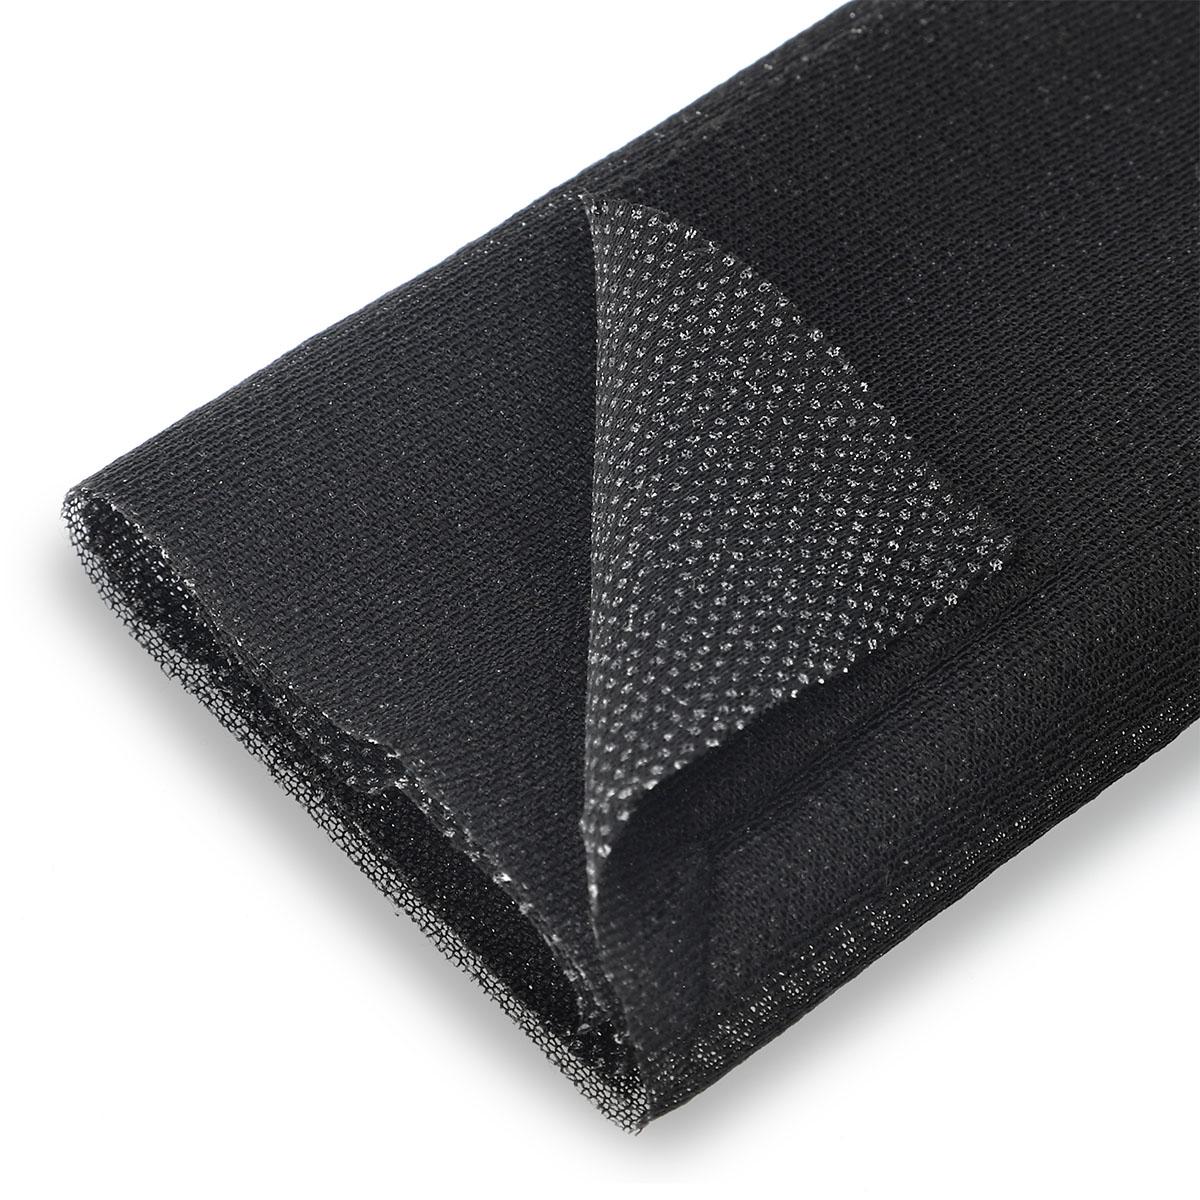 Tissu thermocollant maille noir zoom - Prima Mercerie